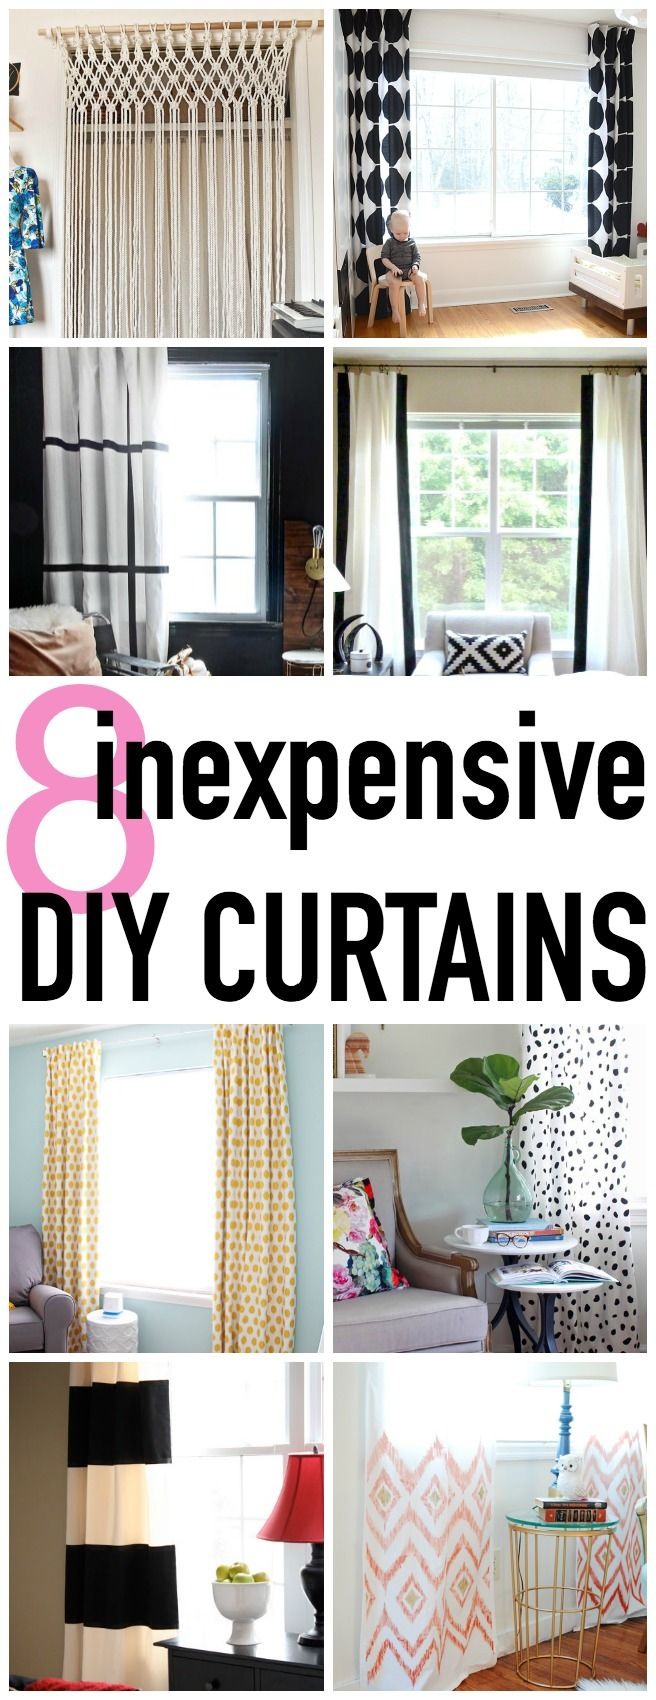 17 Images About Build Ikea Panel Curtain On Pinterest: Diy Curtains, Diy Home Decor, Home Decor